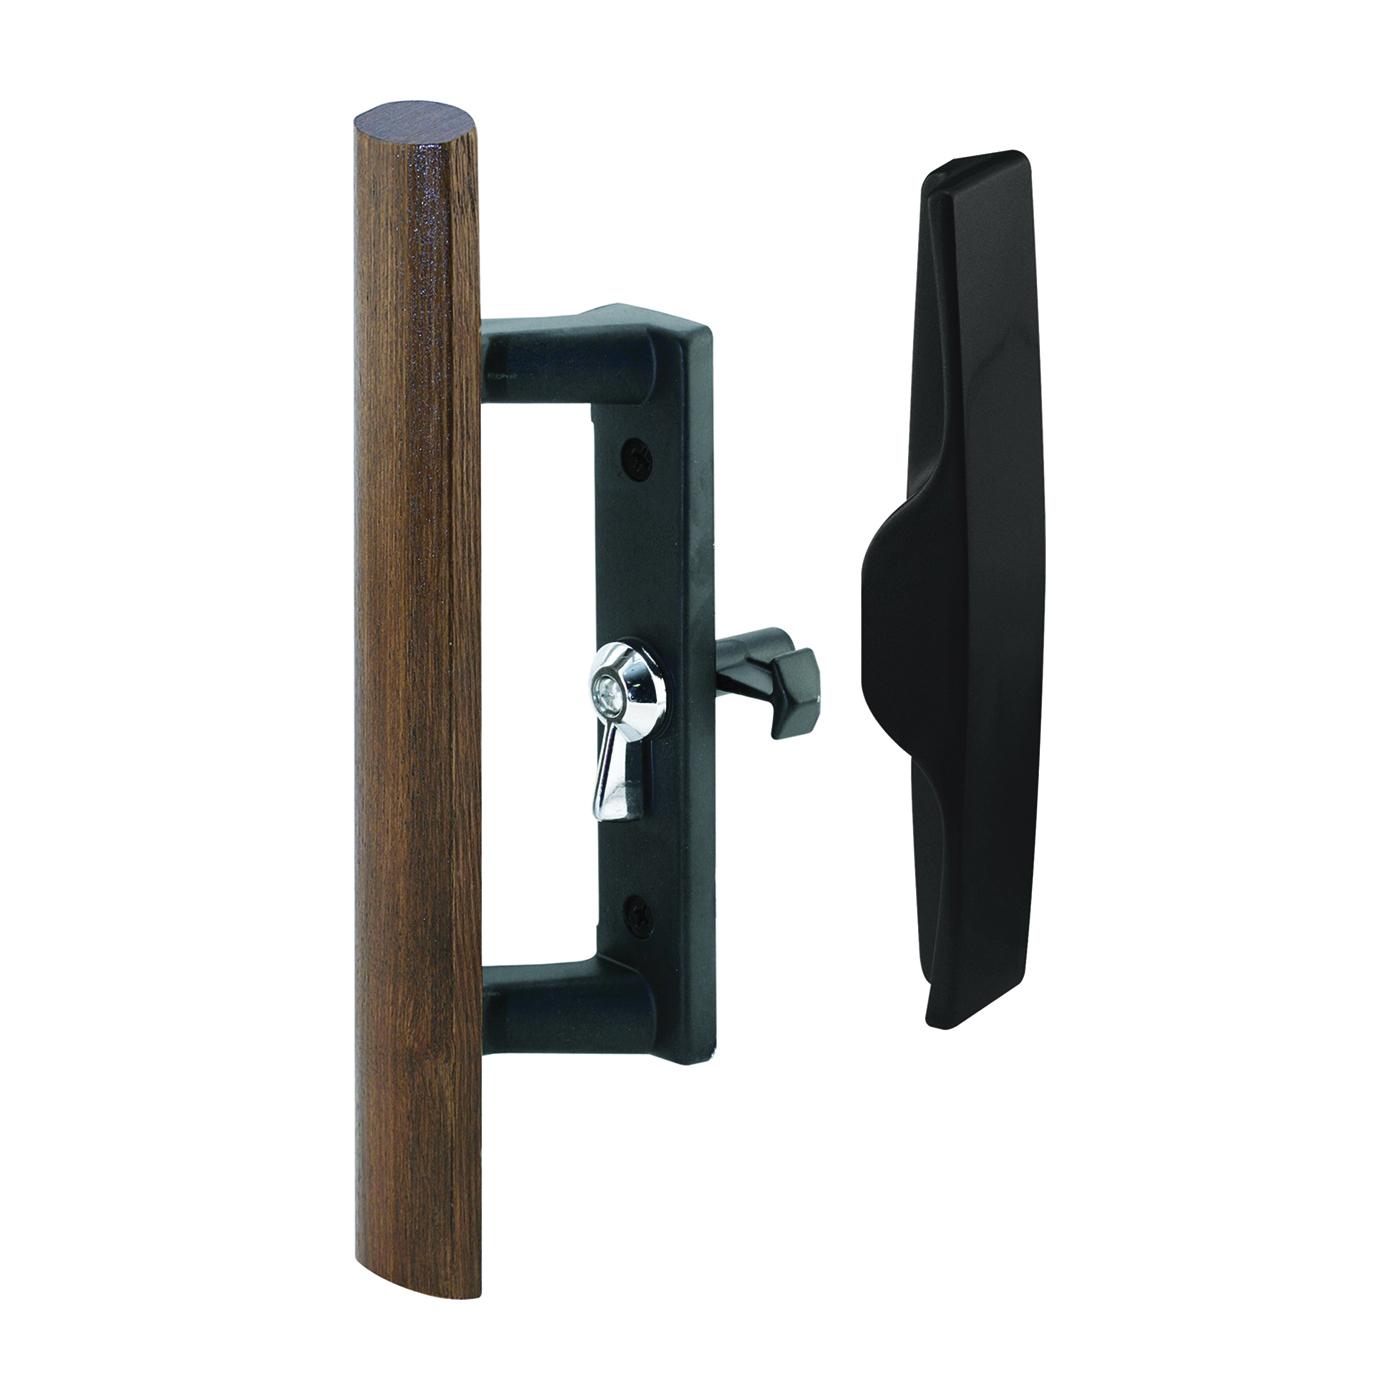 Picture of Prime-Line C 1095 Handle Set, Die-Cast/Wood, Wood, 1 in Thick Door